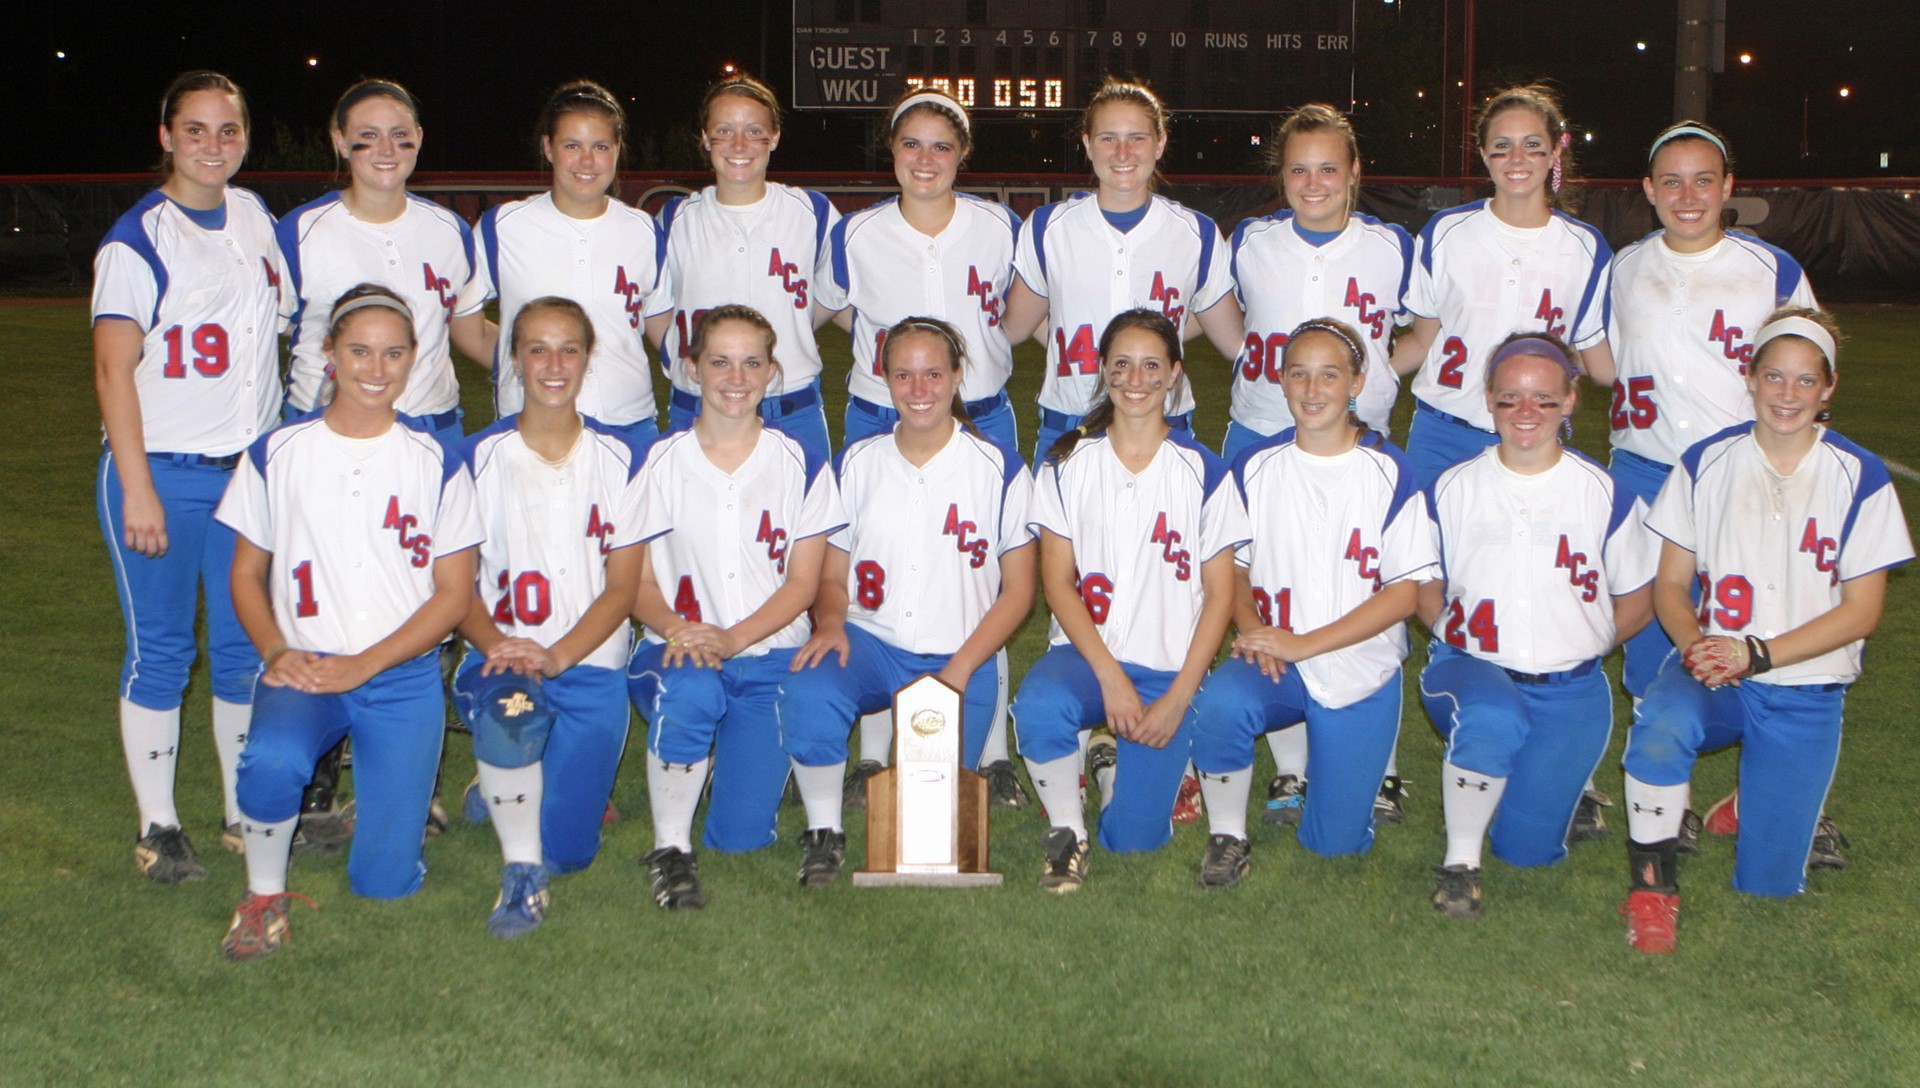 2011 Region 4 Champions